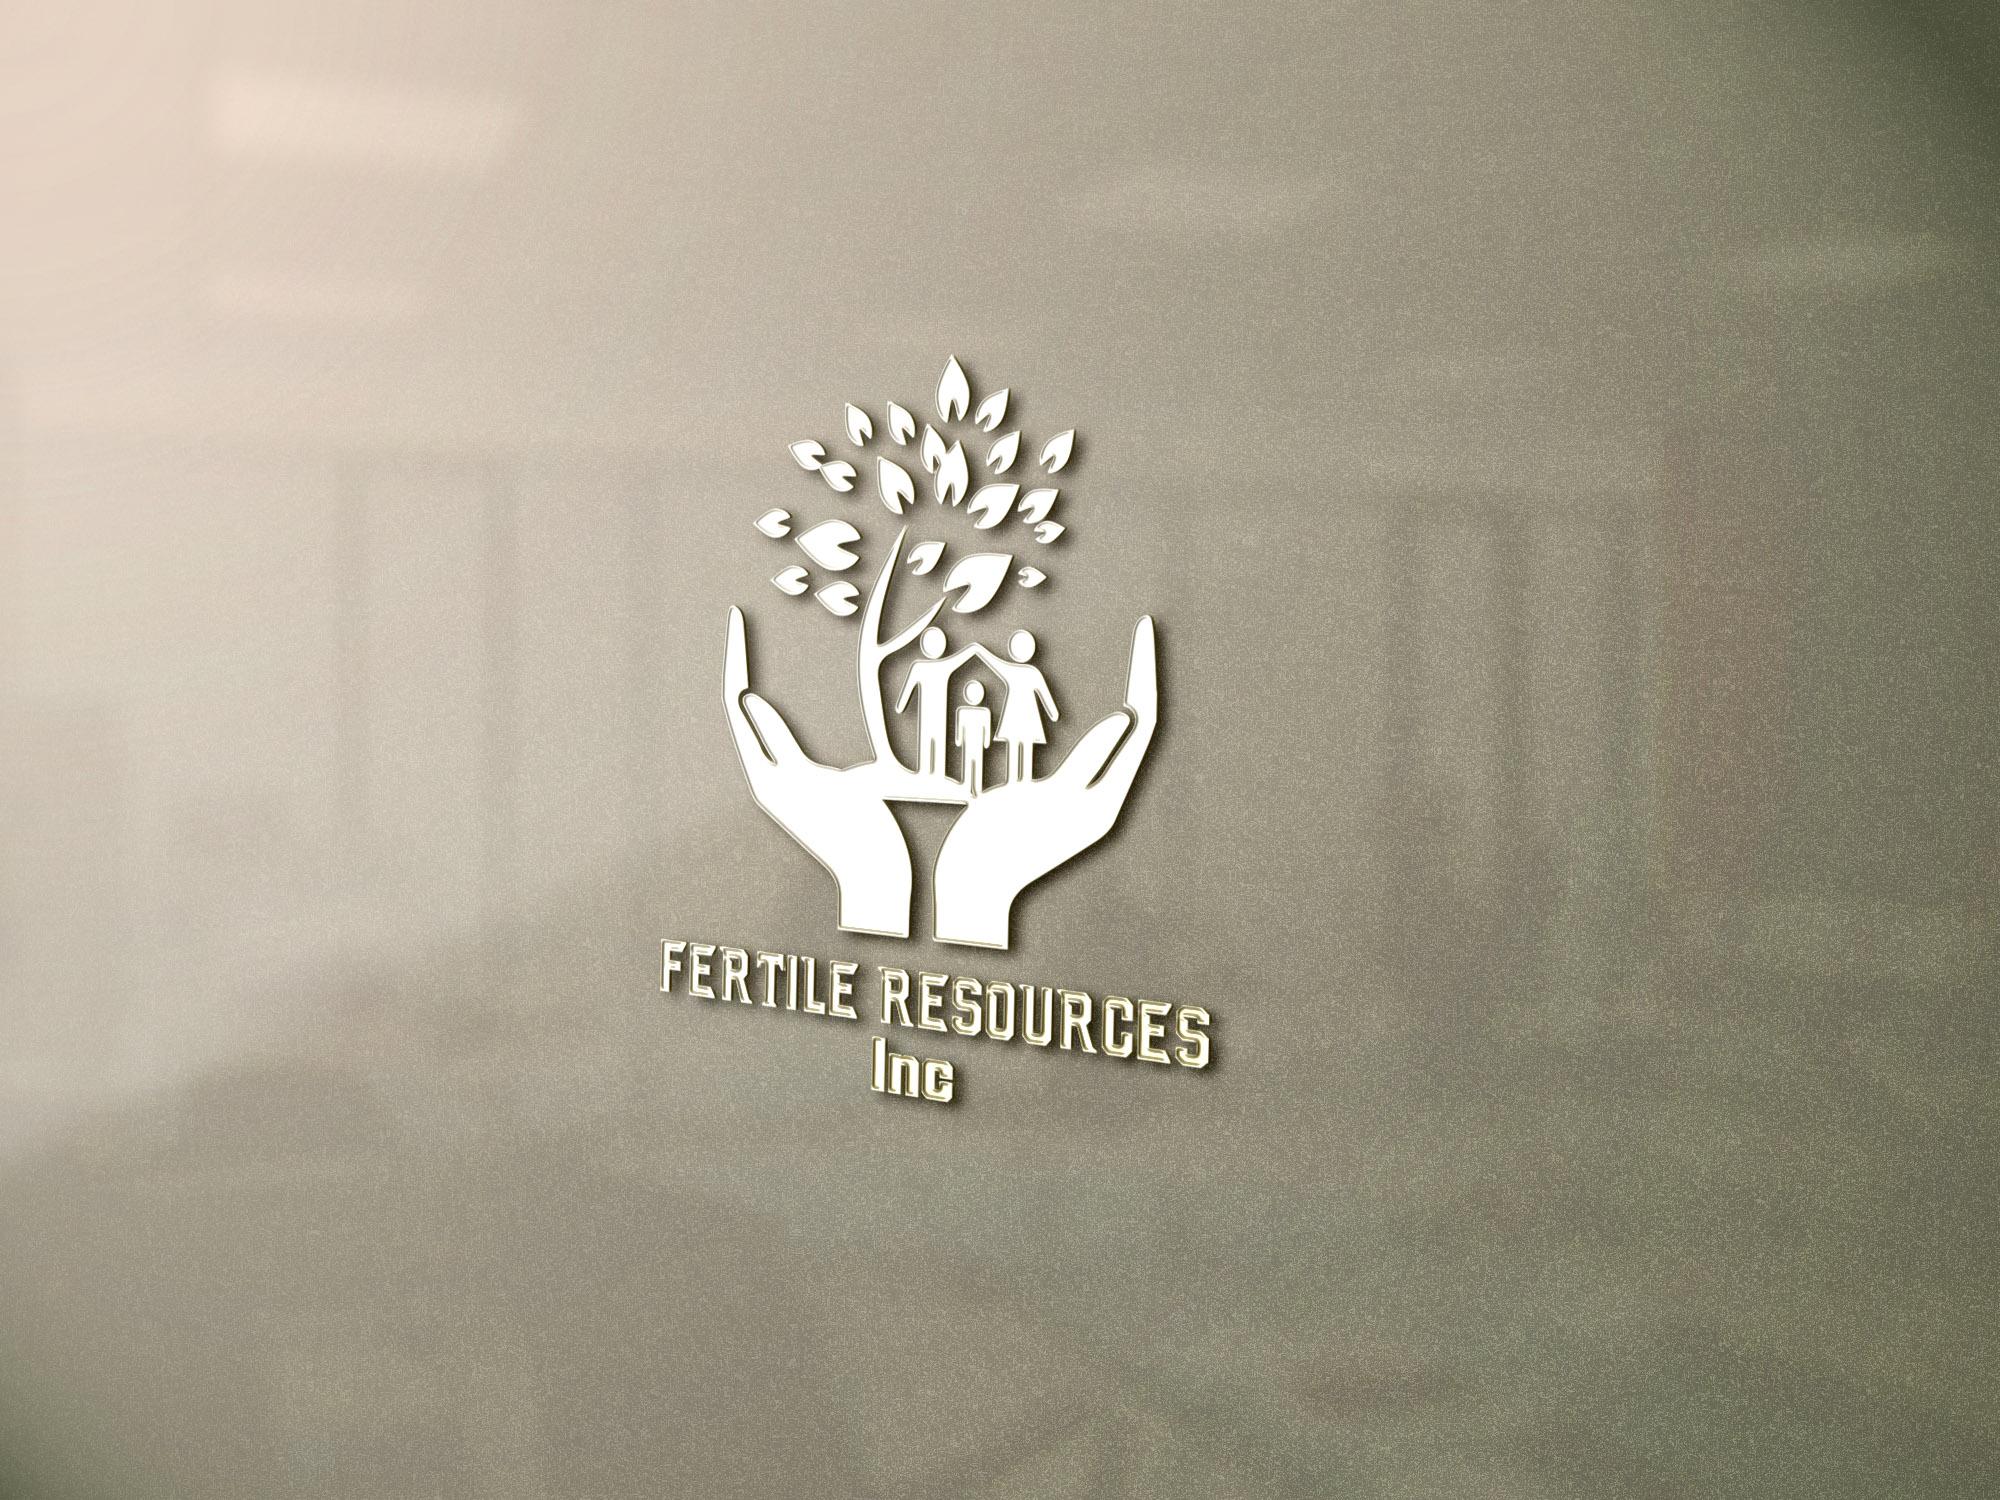 Logo Design by Umair ahmed Iqbal - Entry No. 107 in the Logo Design Contest Fertile Resources, Inc. Logo Design.